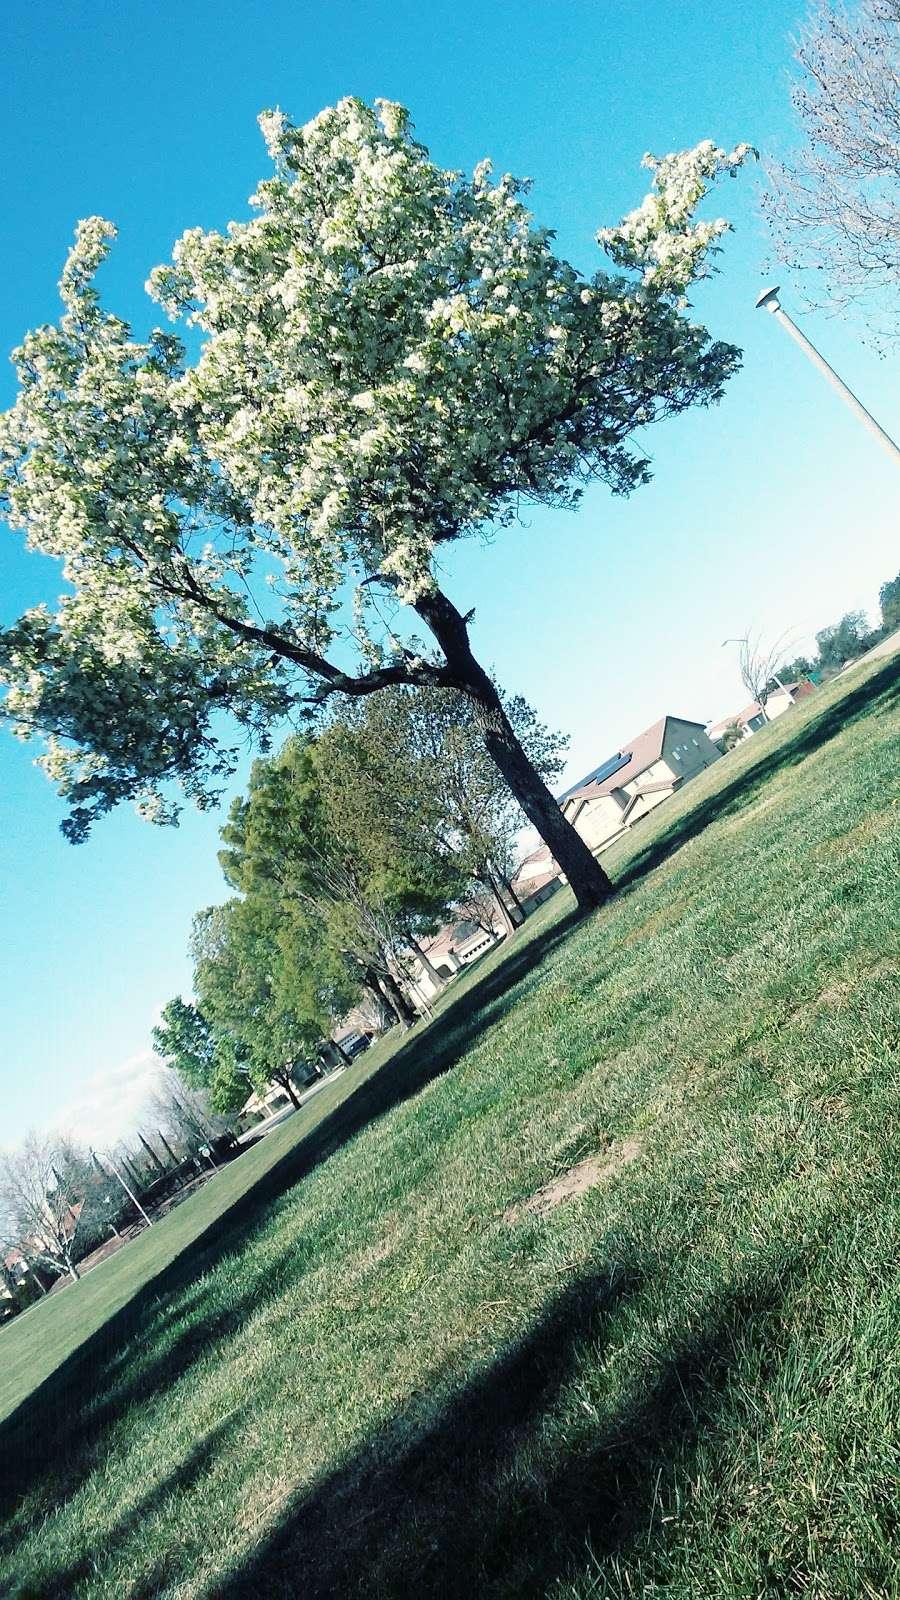 Almondridge Park - park  | Photo 9 of 10 | Address: 3400 Almondridge Dr, Antioch, CA 94509, USA | Phone: (925) 779-6950